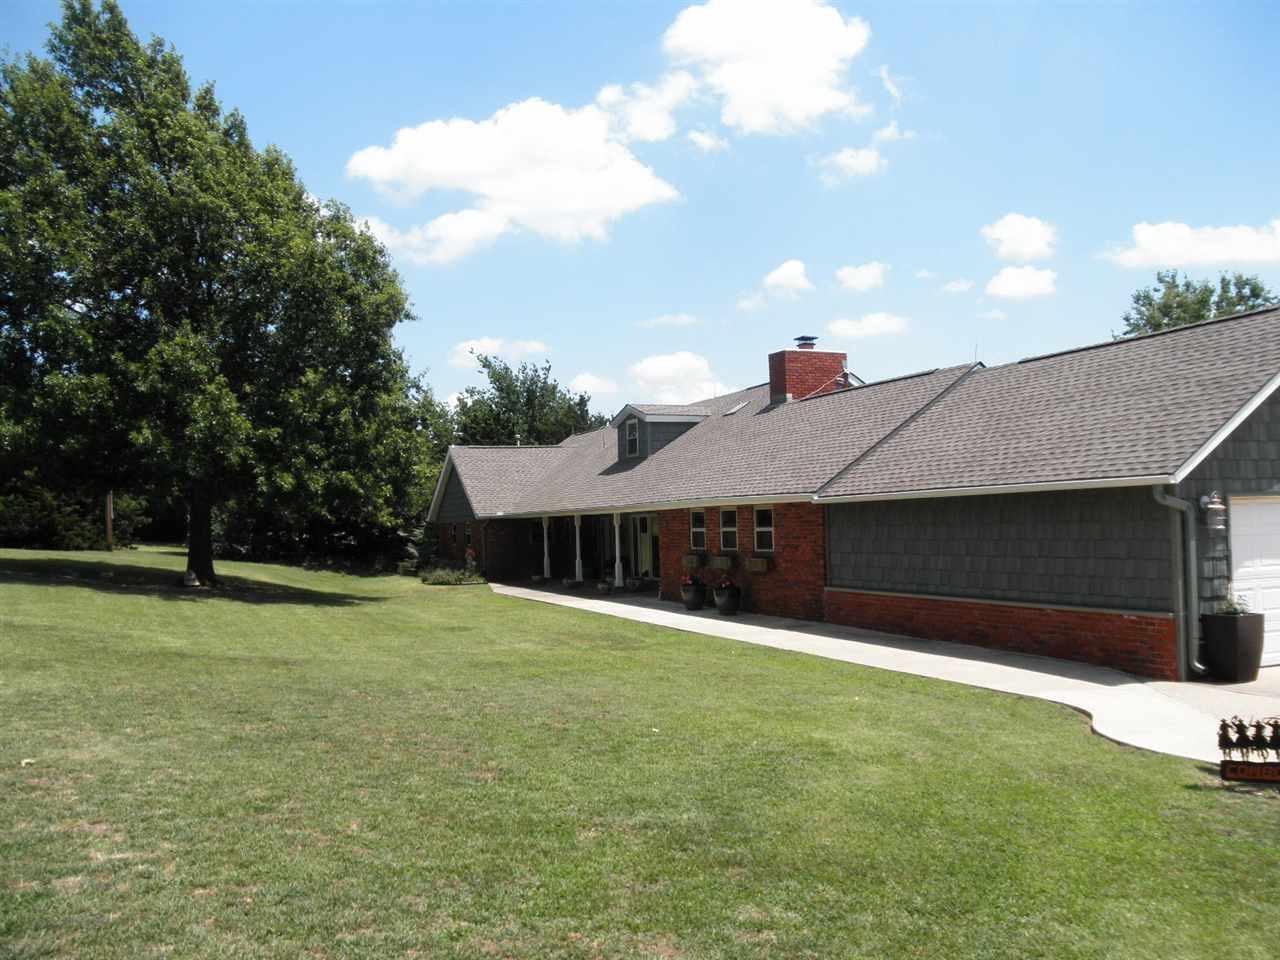 Sold Intraoffice W/MLS | 7038 River Ridge Drive  Ponca City, OK 74604 0